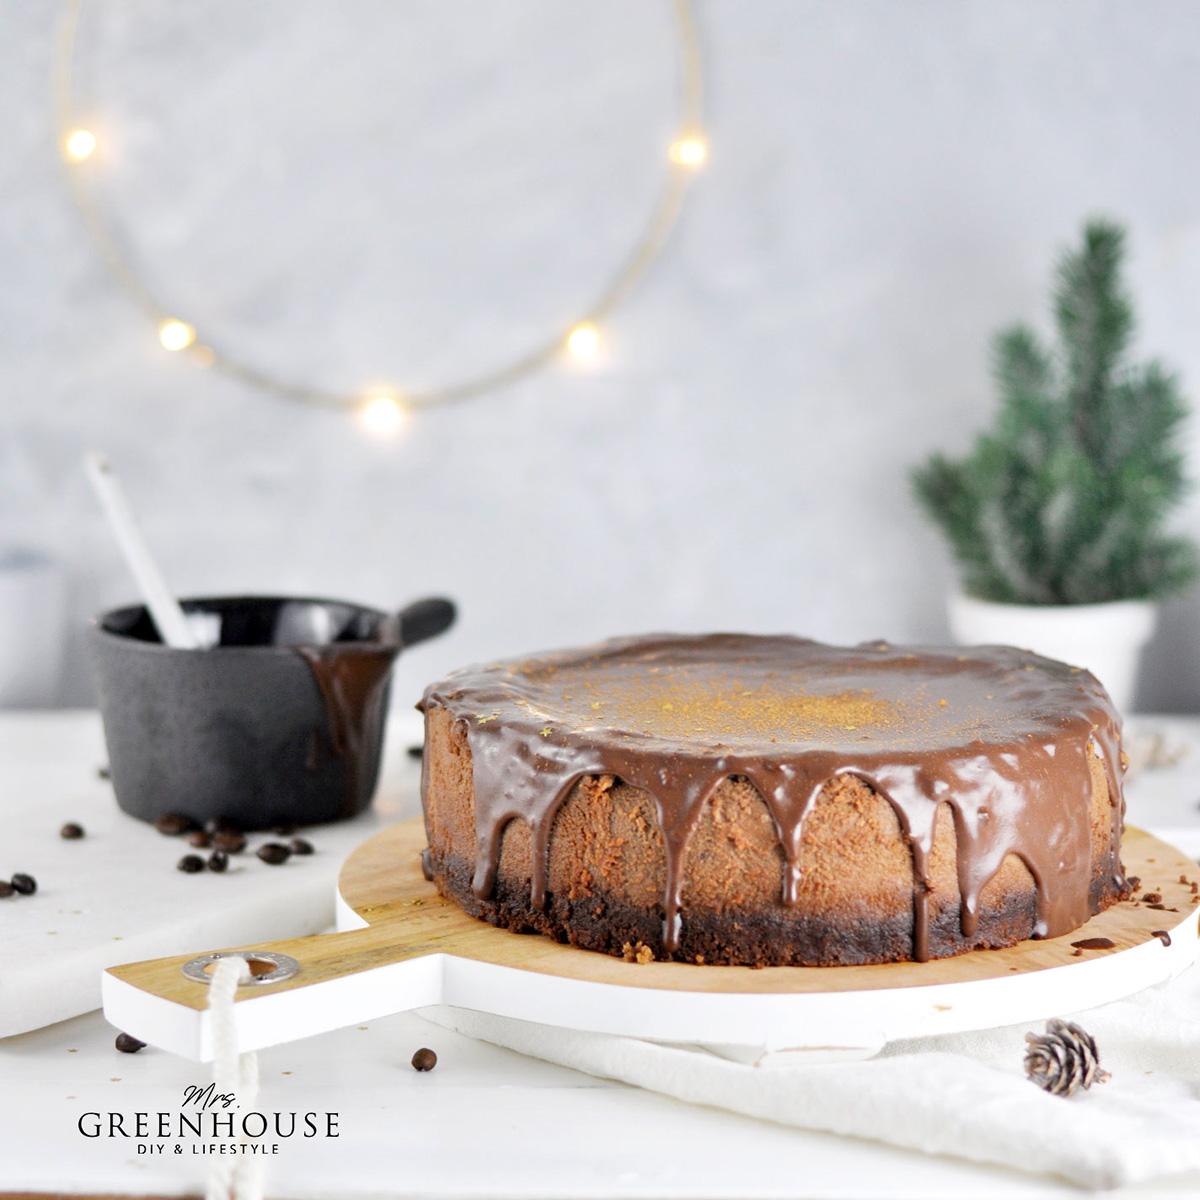 missredfox - 12giftswithlovegoesXMAS - 12 - mrsgreenhouse - Chocolate Cheesecake